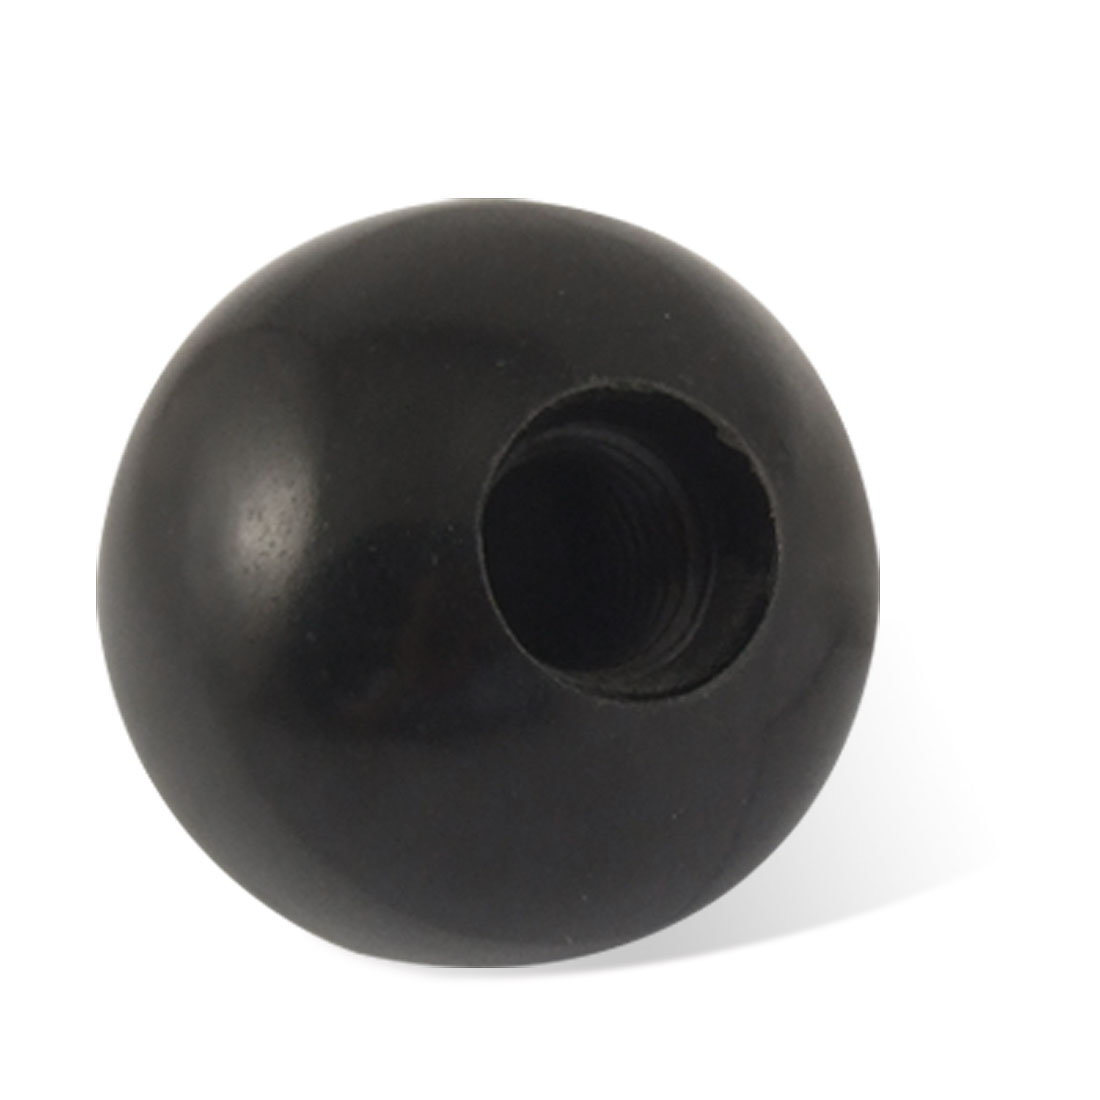 Solid Black Round Plastic 30mm Diameter Ball Lever Knob